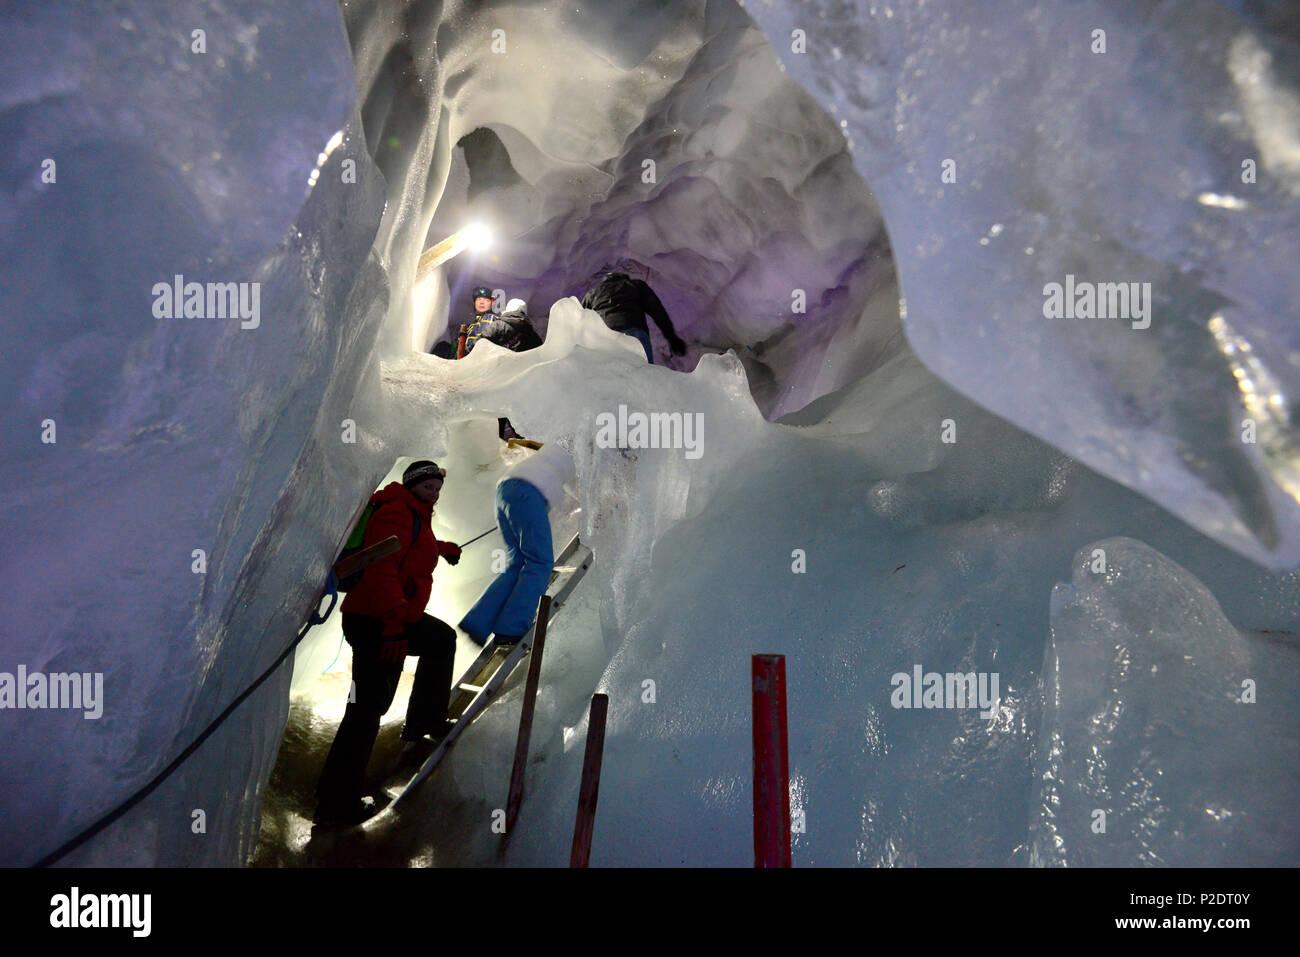 Natural ice palace at Hintertux glacier, Tux valley, Tyrol, Austria - Stock Image